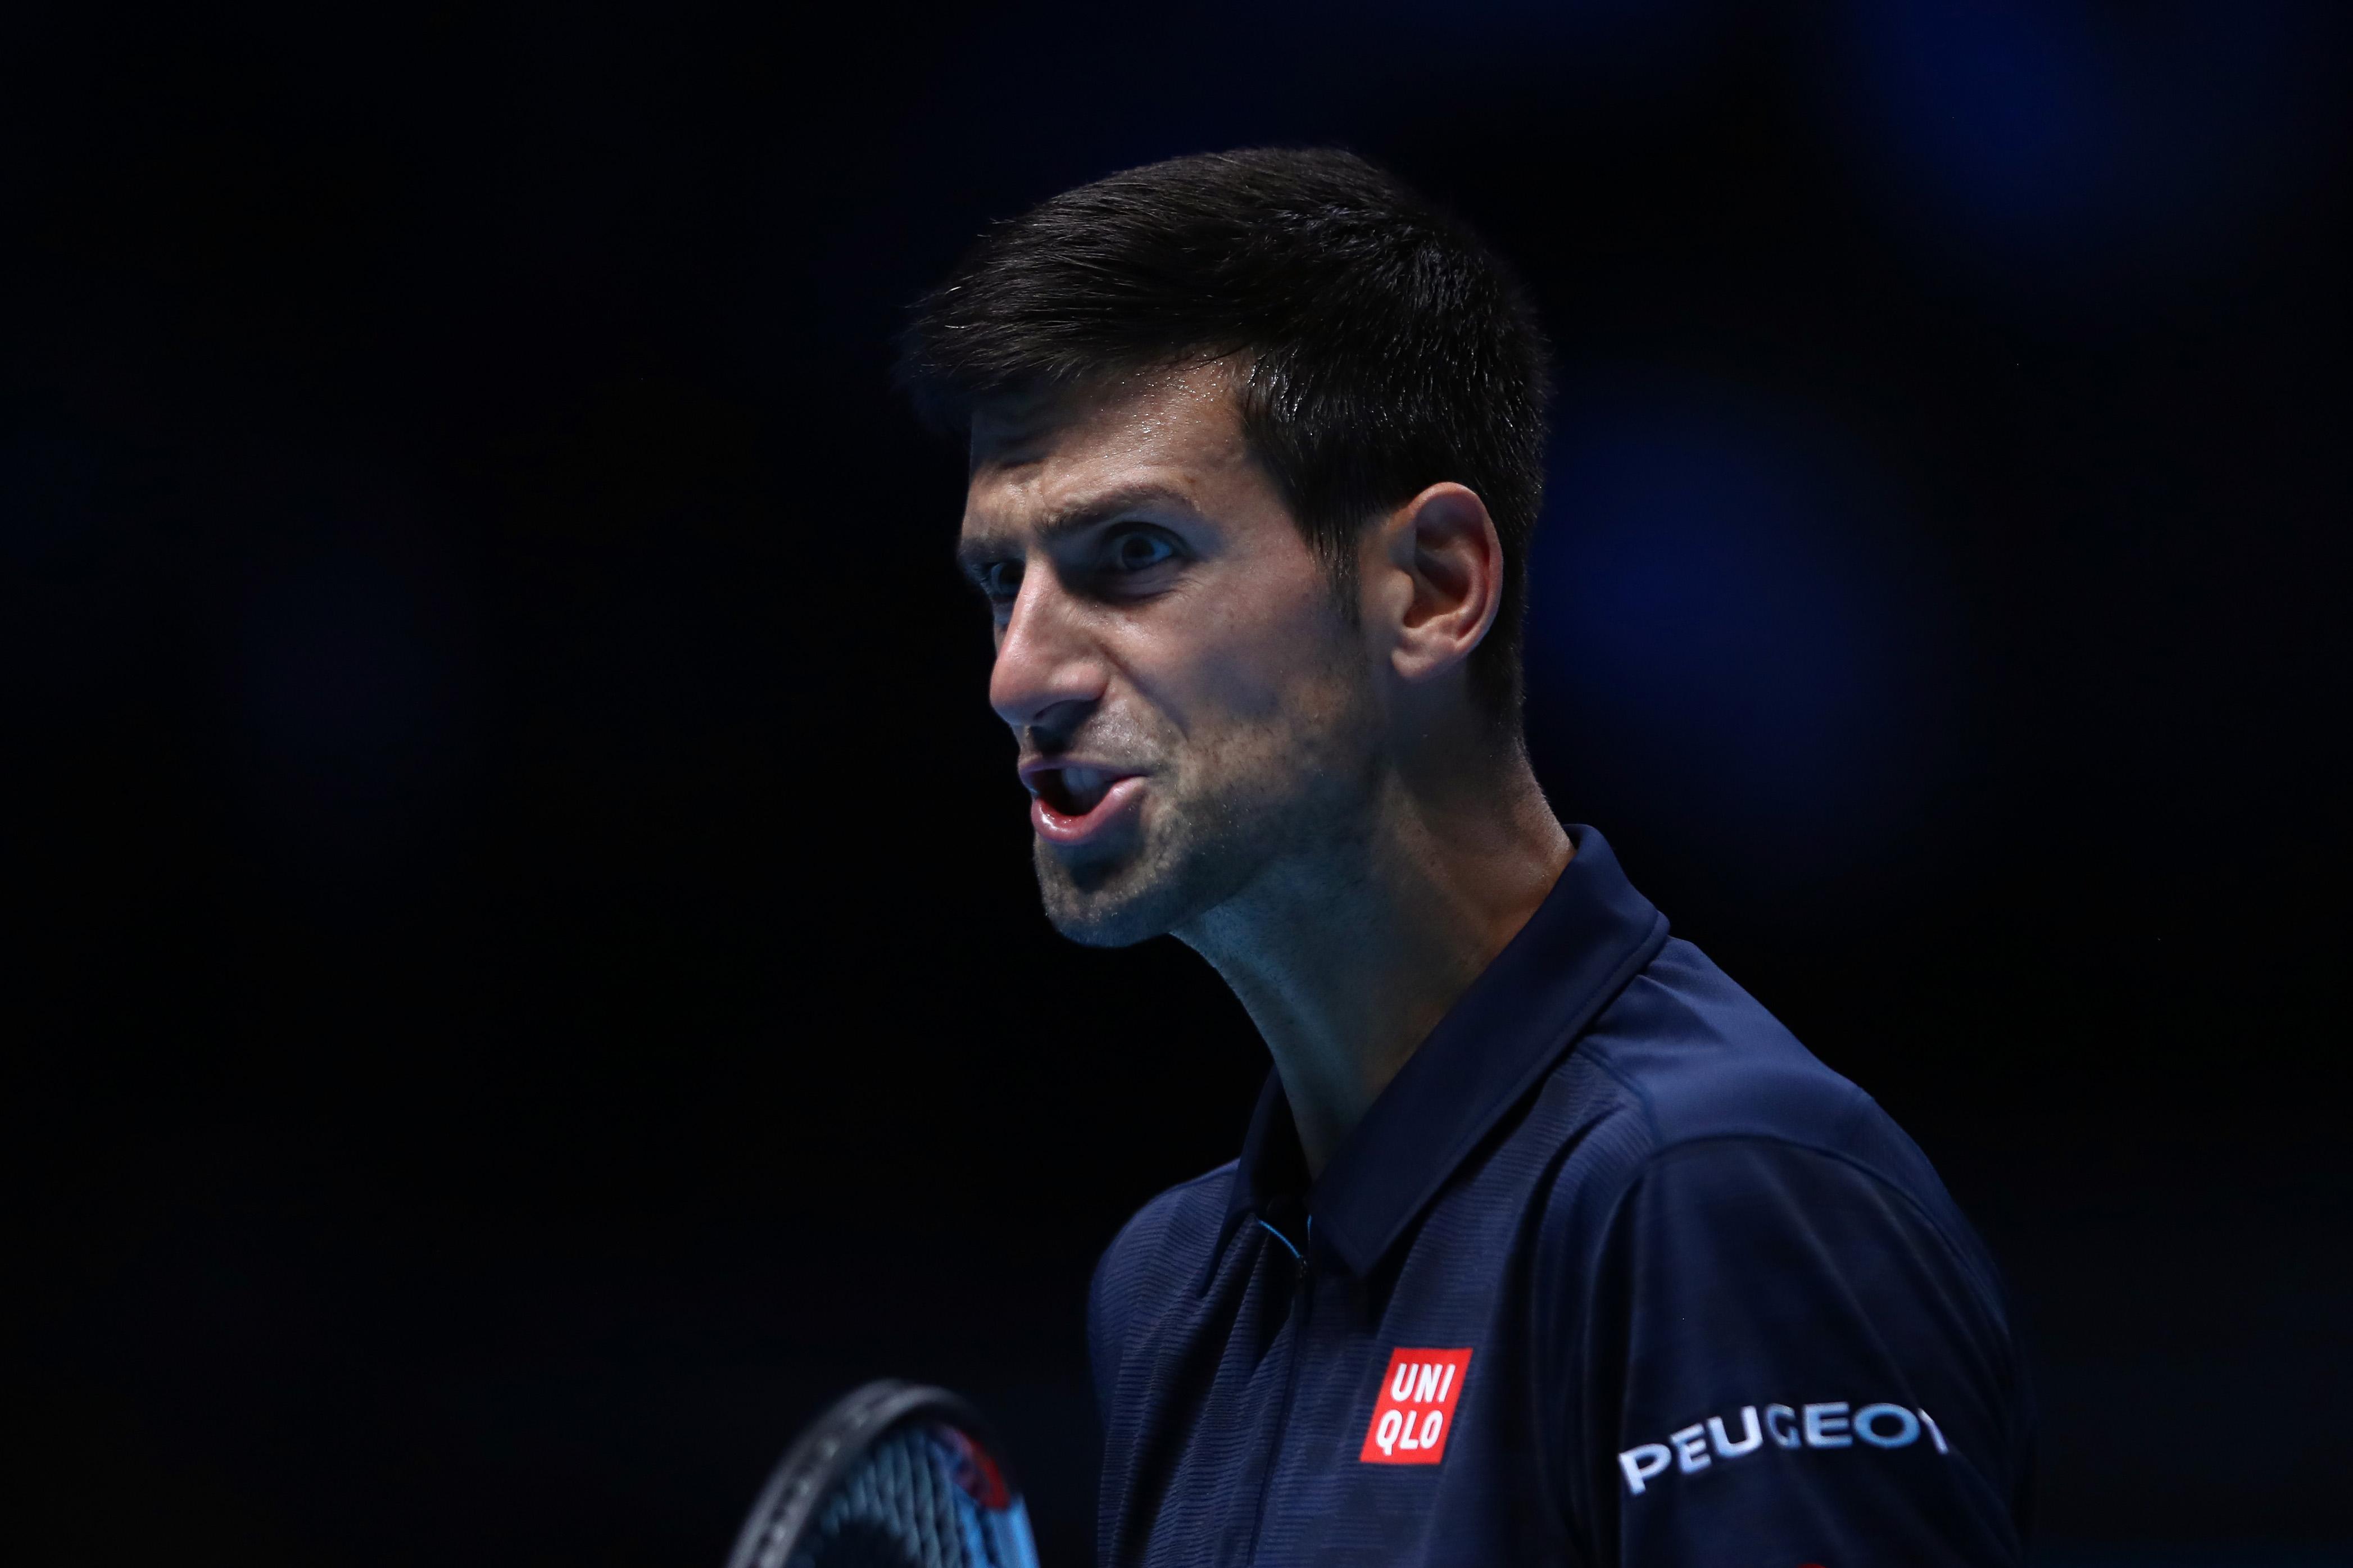 ATP World Finals 2016 Day 3 Debrief: Novak Djokovic reaches semi-finals as Jamie Murray wins